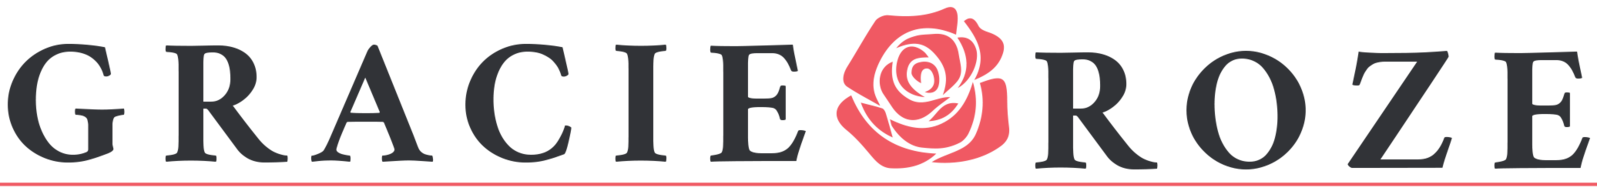 GracieRoze_Logo_copy_1600x